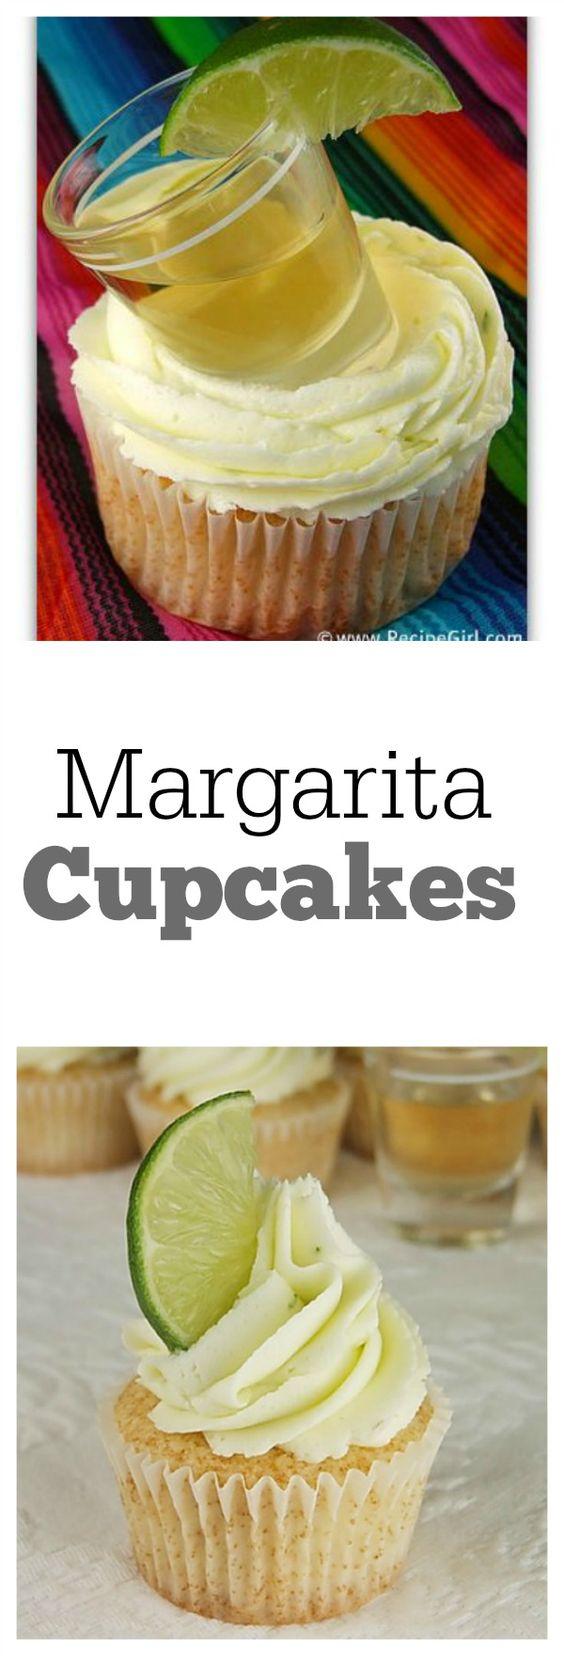 Margarita cupcakes, Margaritas and Tequila on Pinterest